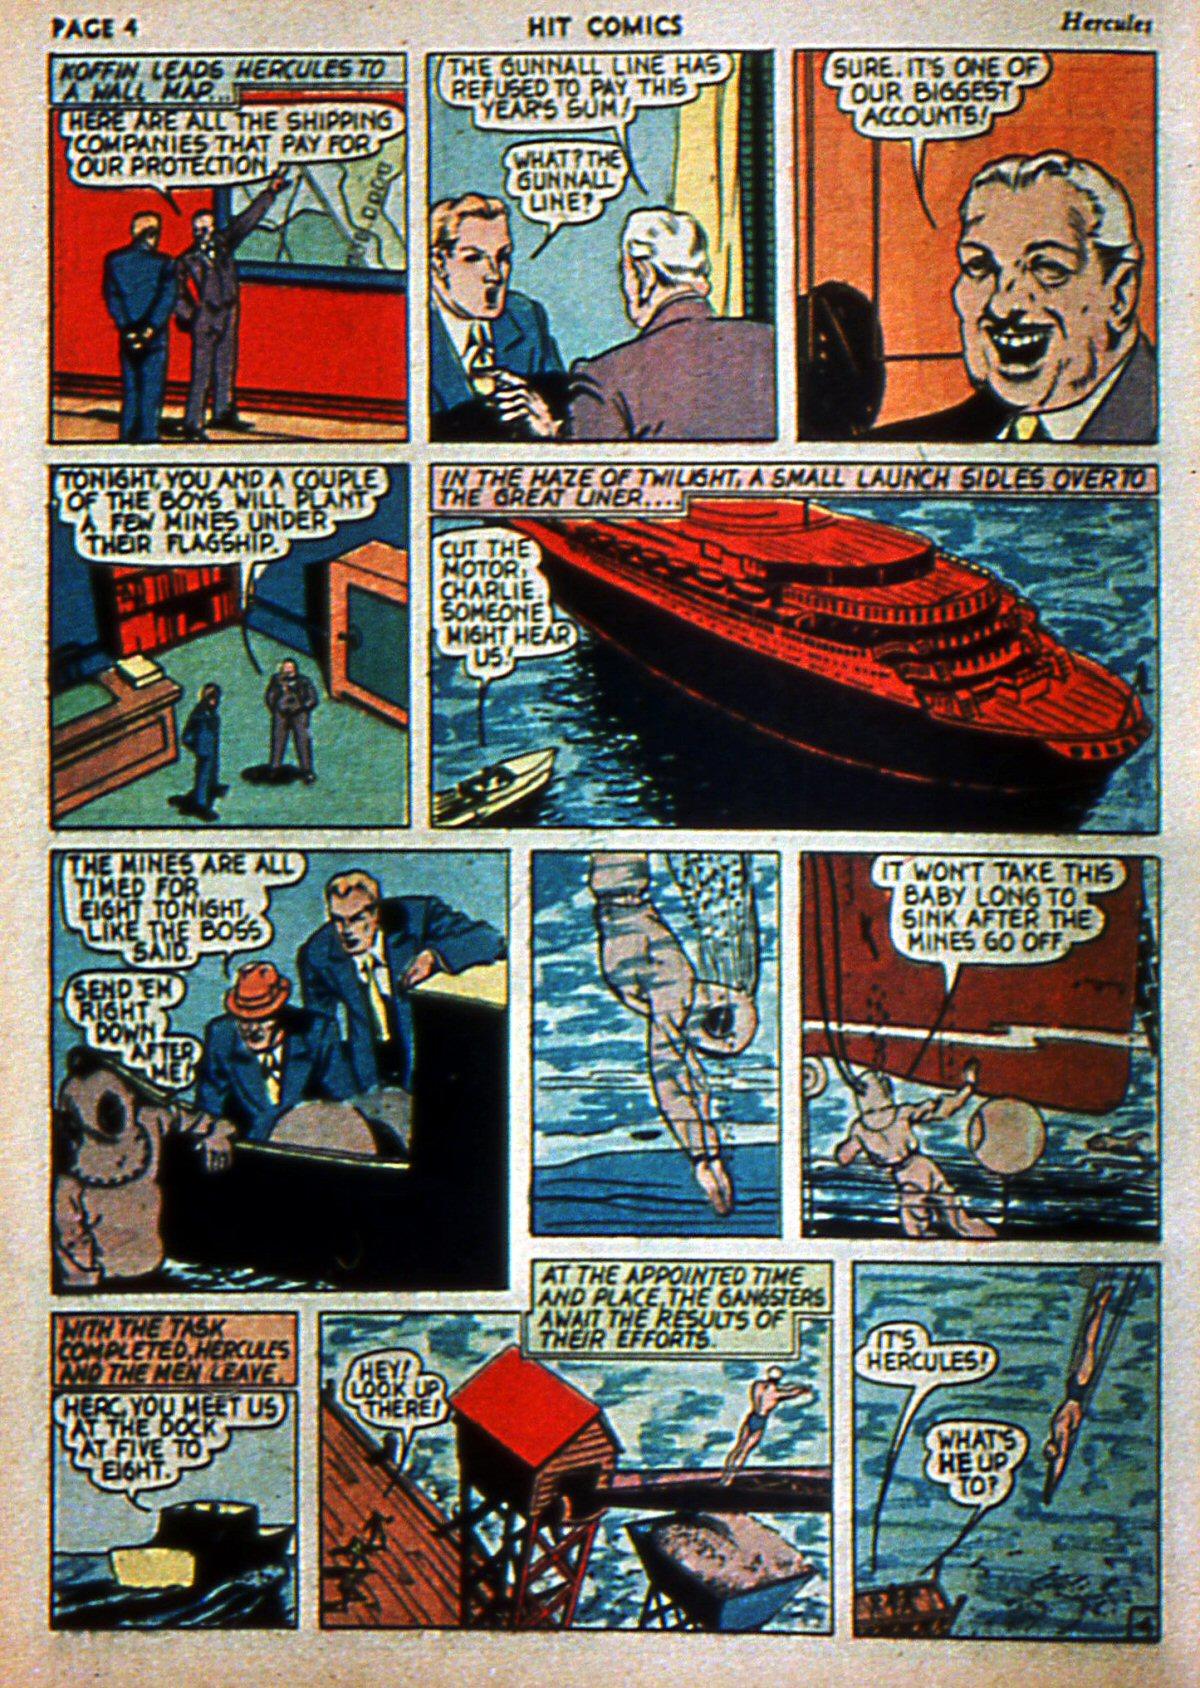 Read online Hit Comics comic -  Issue #3 - 6